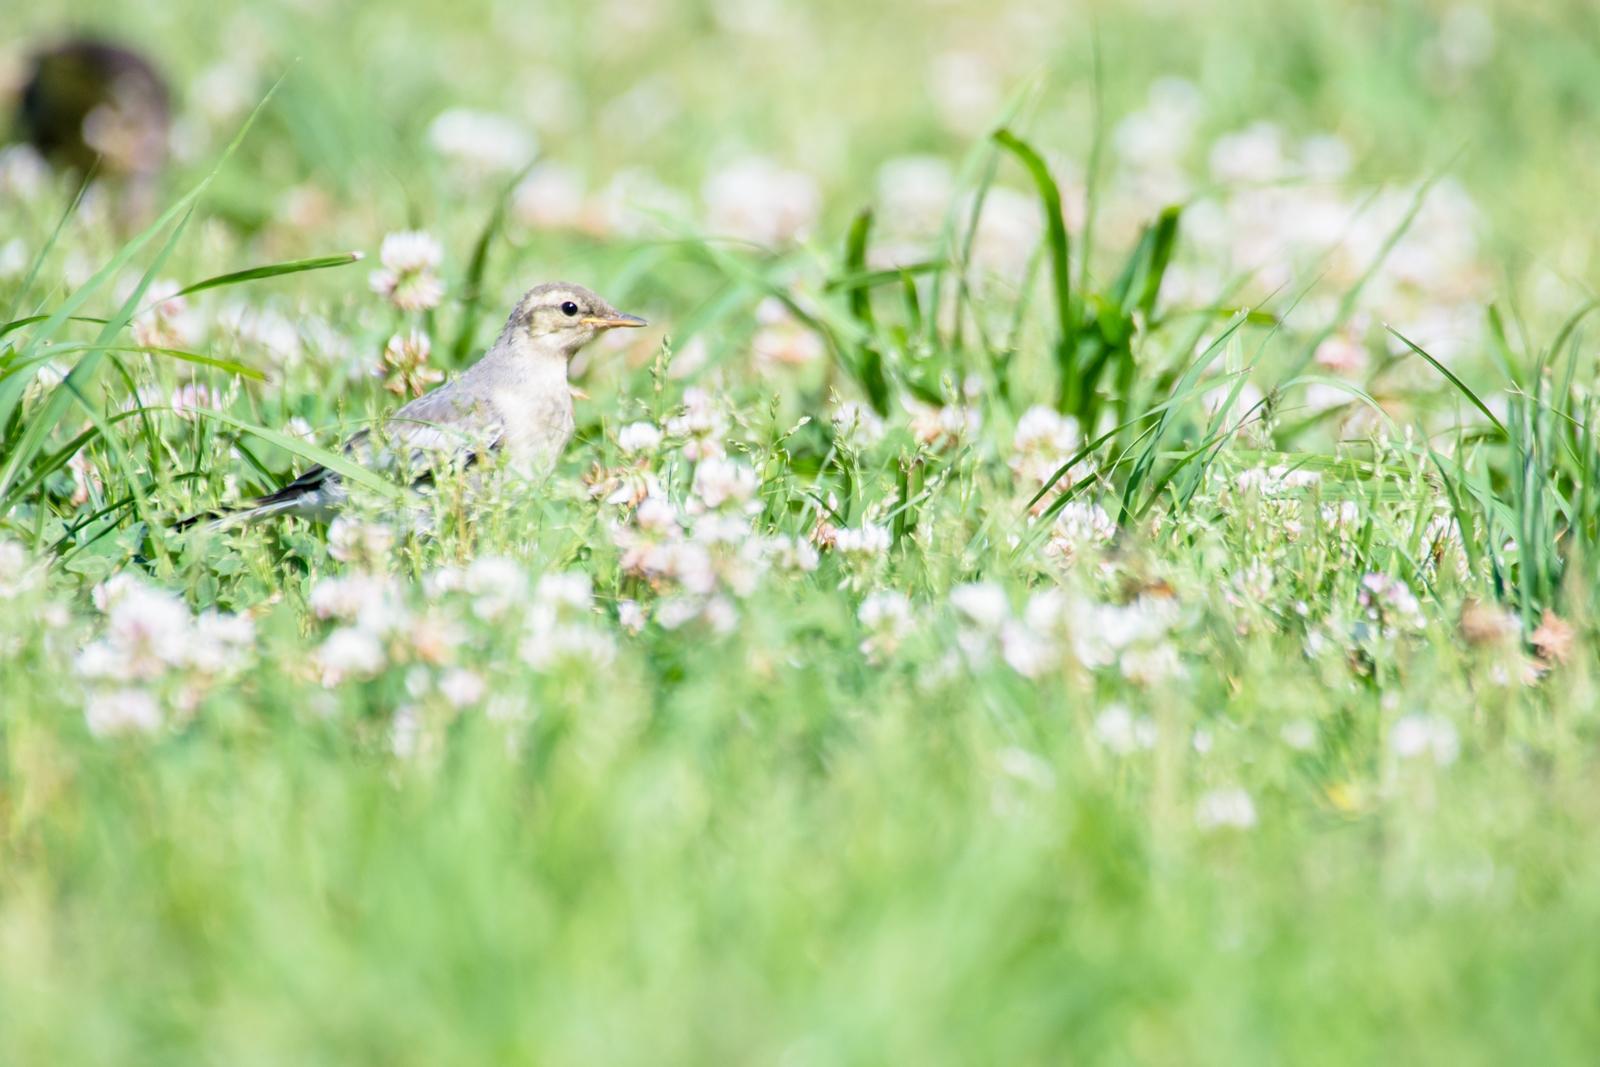 Photo: 小さな花たちに囲まれて Surrounded by a small flowers.  少しずつ 自分の足で歩んでいく 初夏の草花も歓迎するかのように 柔らかな色で包み込む  Juvenile of White Wagtail. (ハクセキレイの幼鳥)  #birdphotography #birds  #cooljapan #kawaii  #nikon #sigma   Nikon D7200 SIGMA APO 50-500mm F5-6.3 DG OS HSM  ・小鳥の詩朗読 /poetry reading https://youtu.be/dnh4jVKFrQo?list=PL2YtHGm0-R3qVsaqvQe9OYdJFCkI98wzF